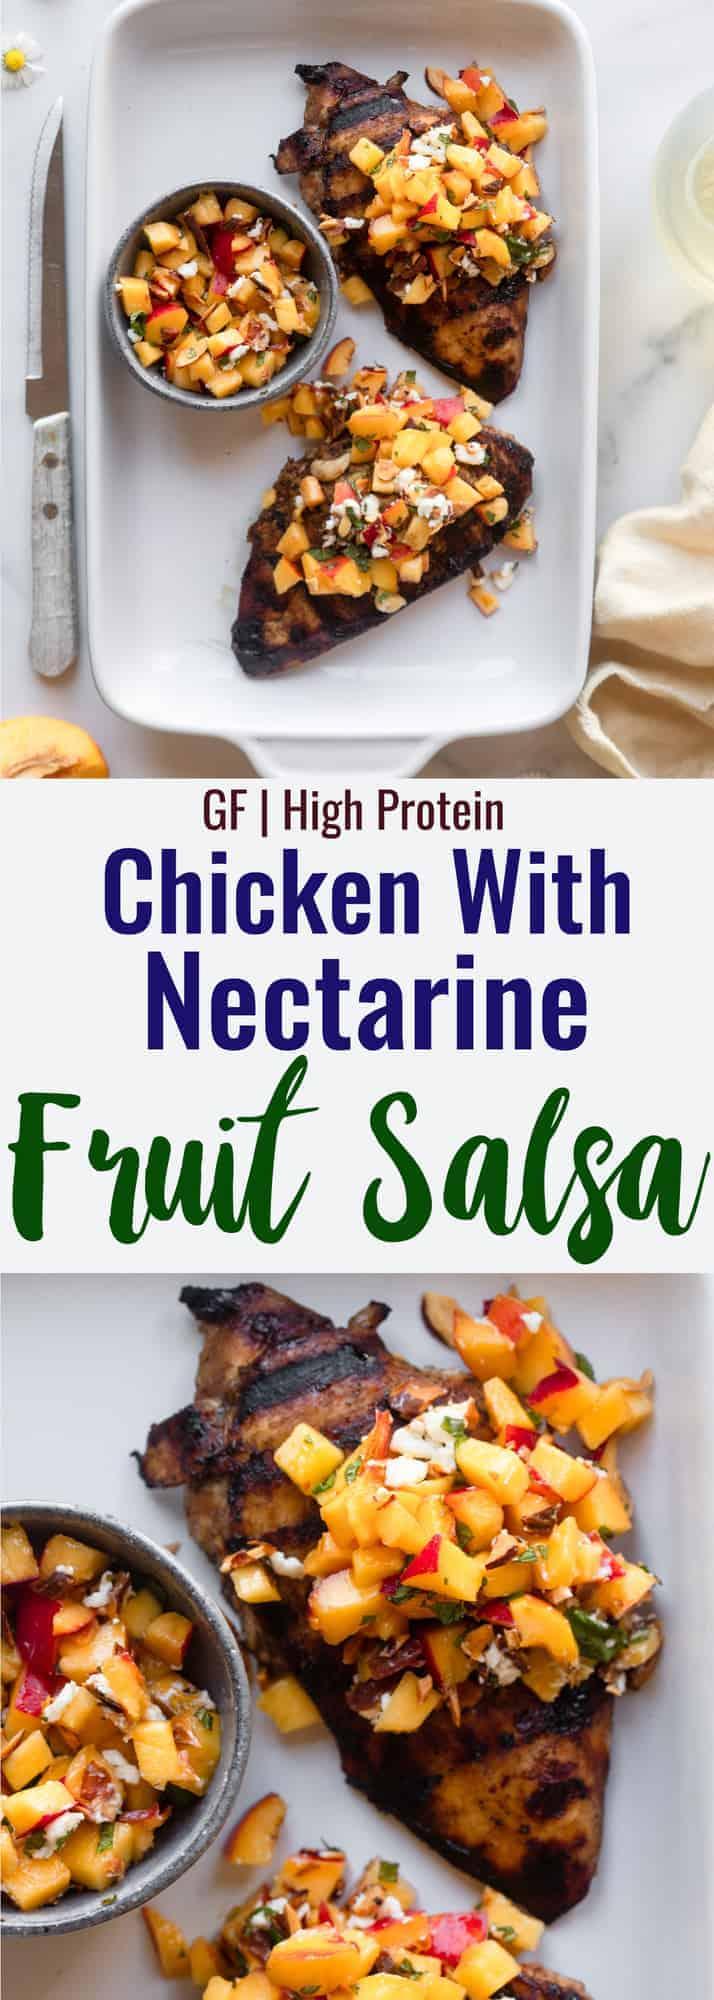 Nectarine Fruit Salsa collage photo